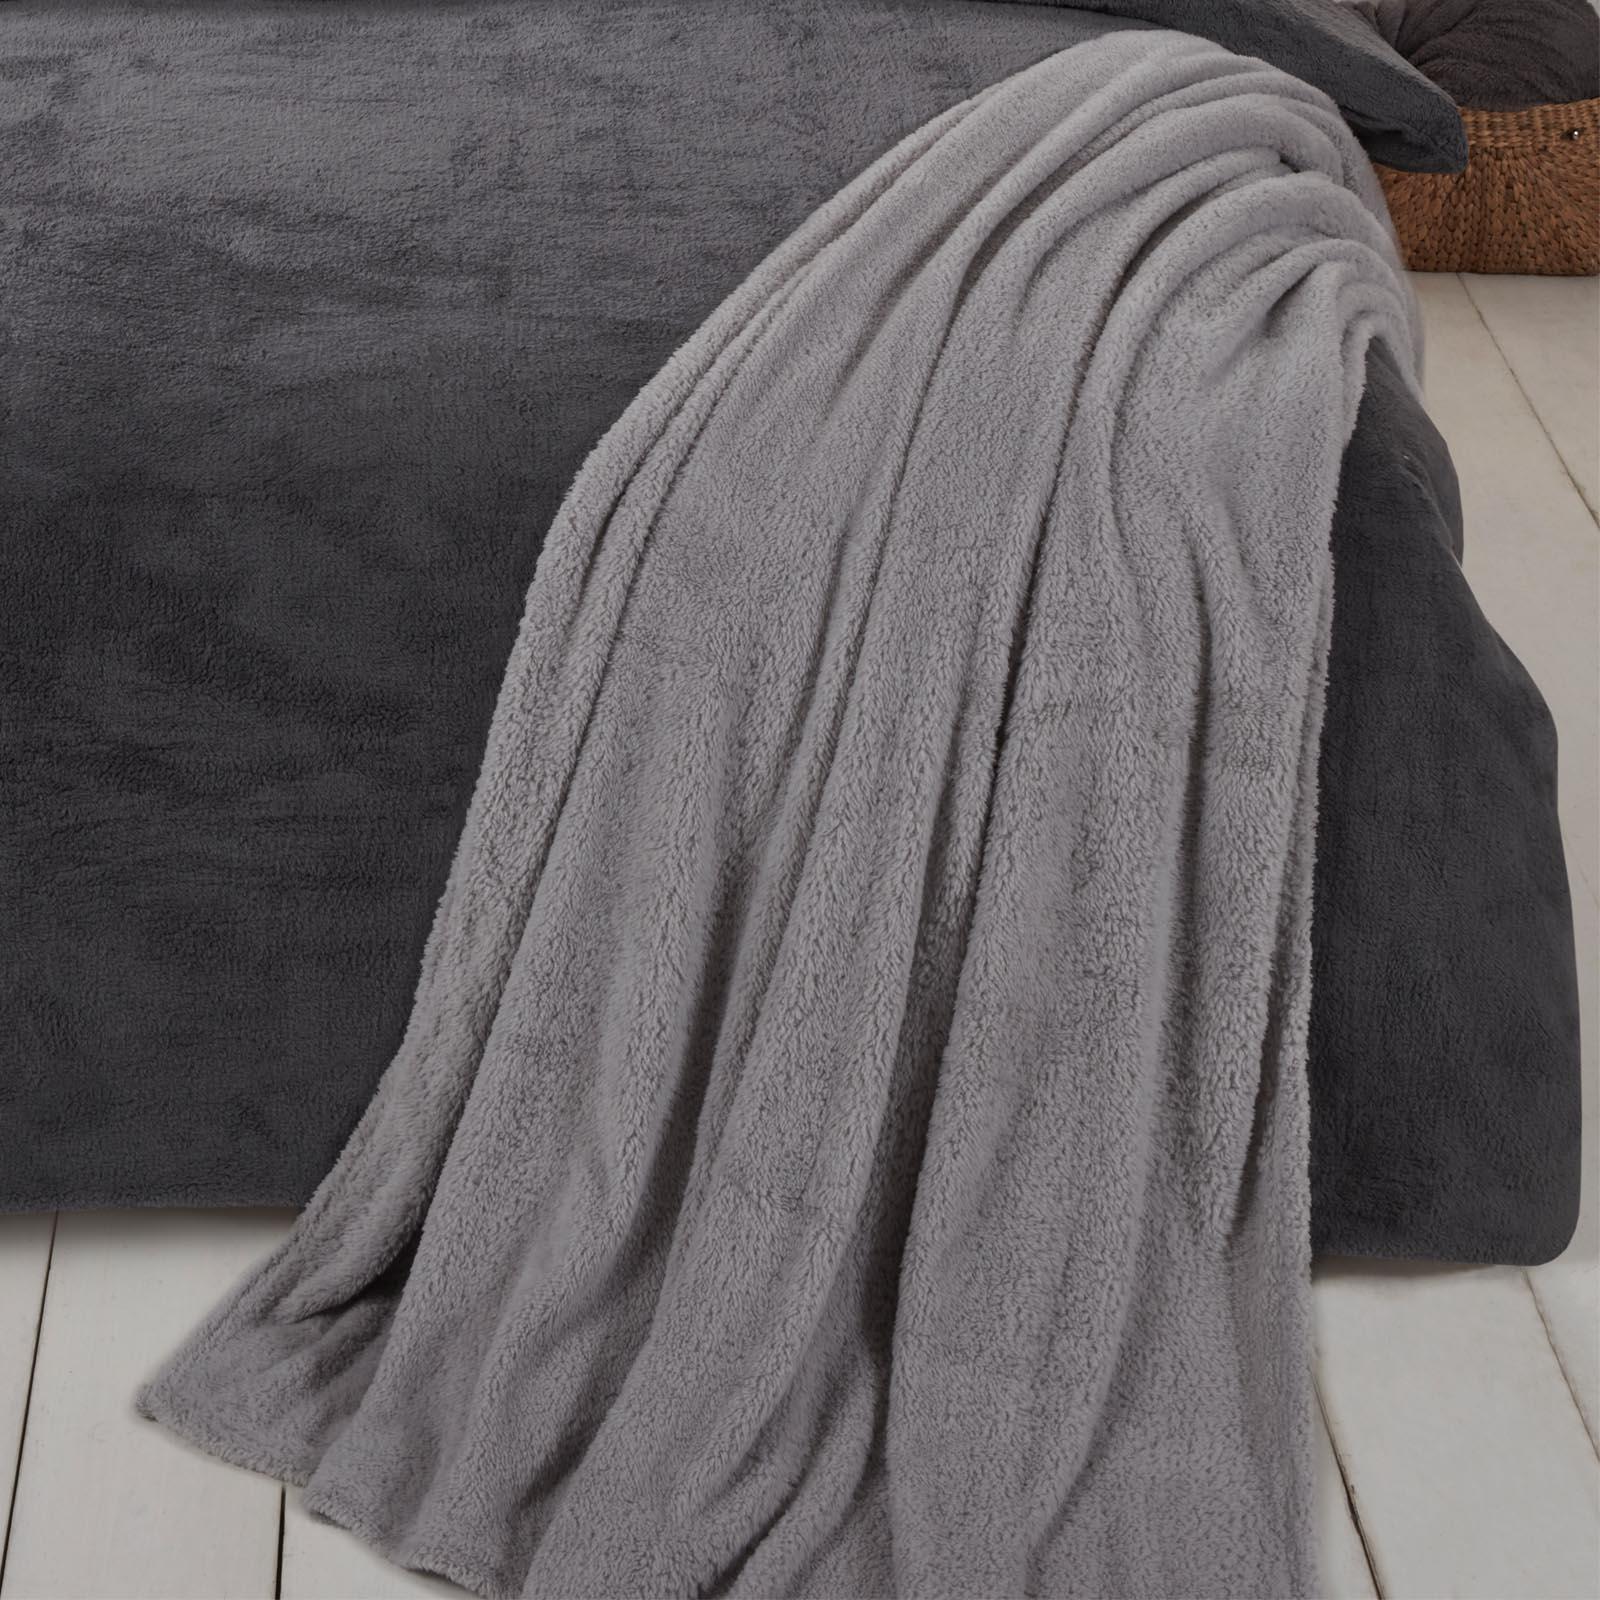 Brentfords-Teddy-Fleece-Bear-Blanket-Large-Throw-Over-Bed-Plush-Soft-Bedspread thumbnail 20